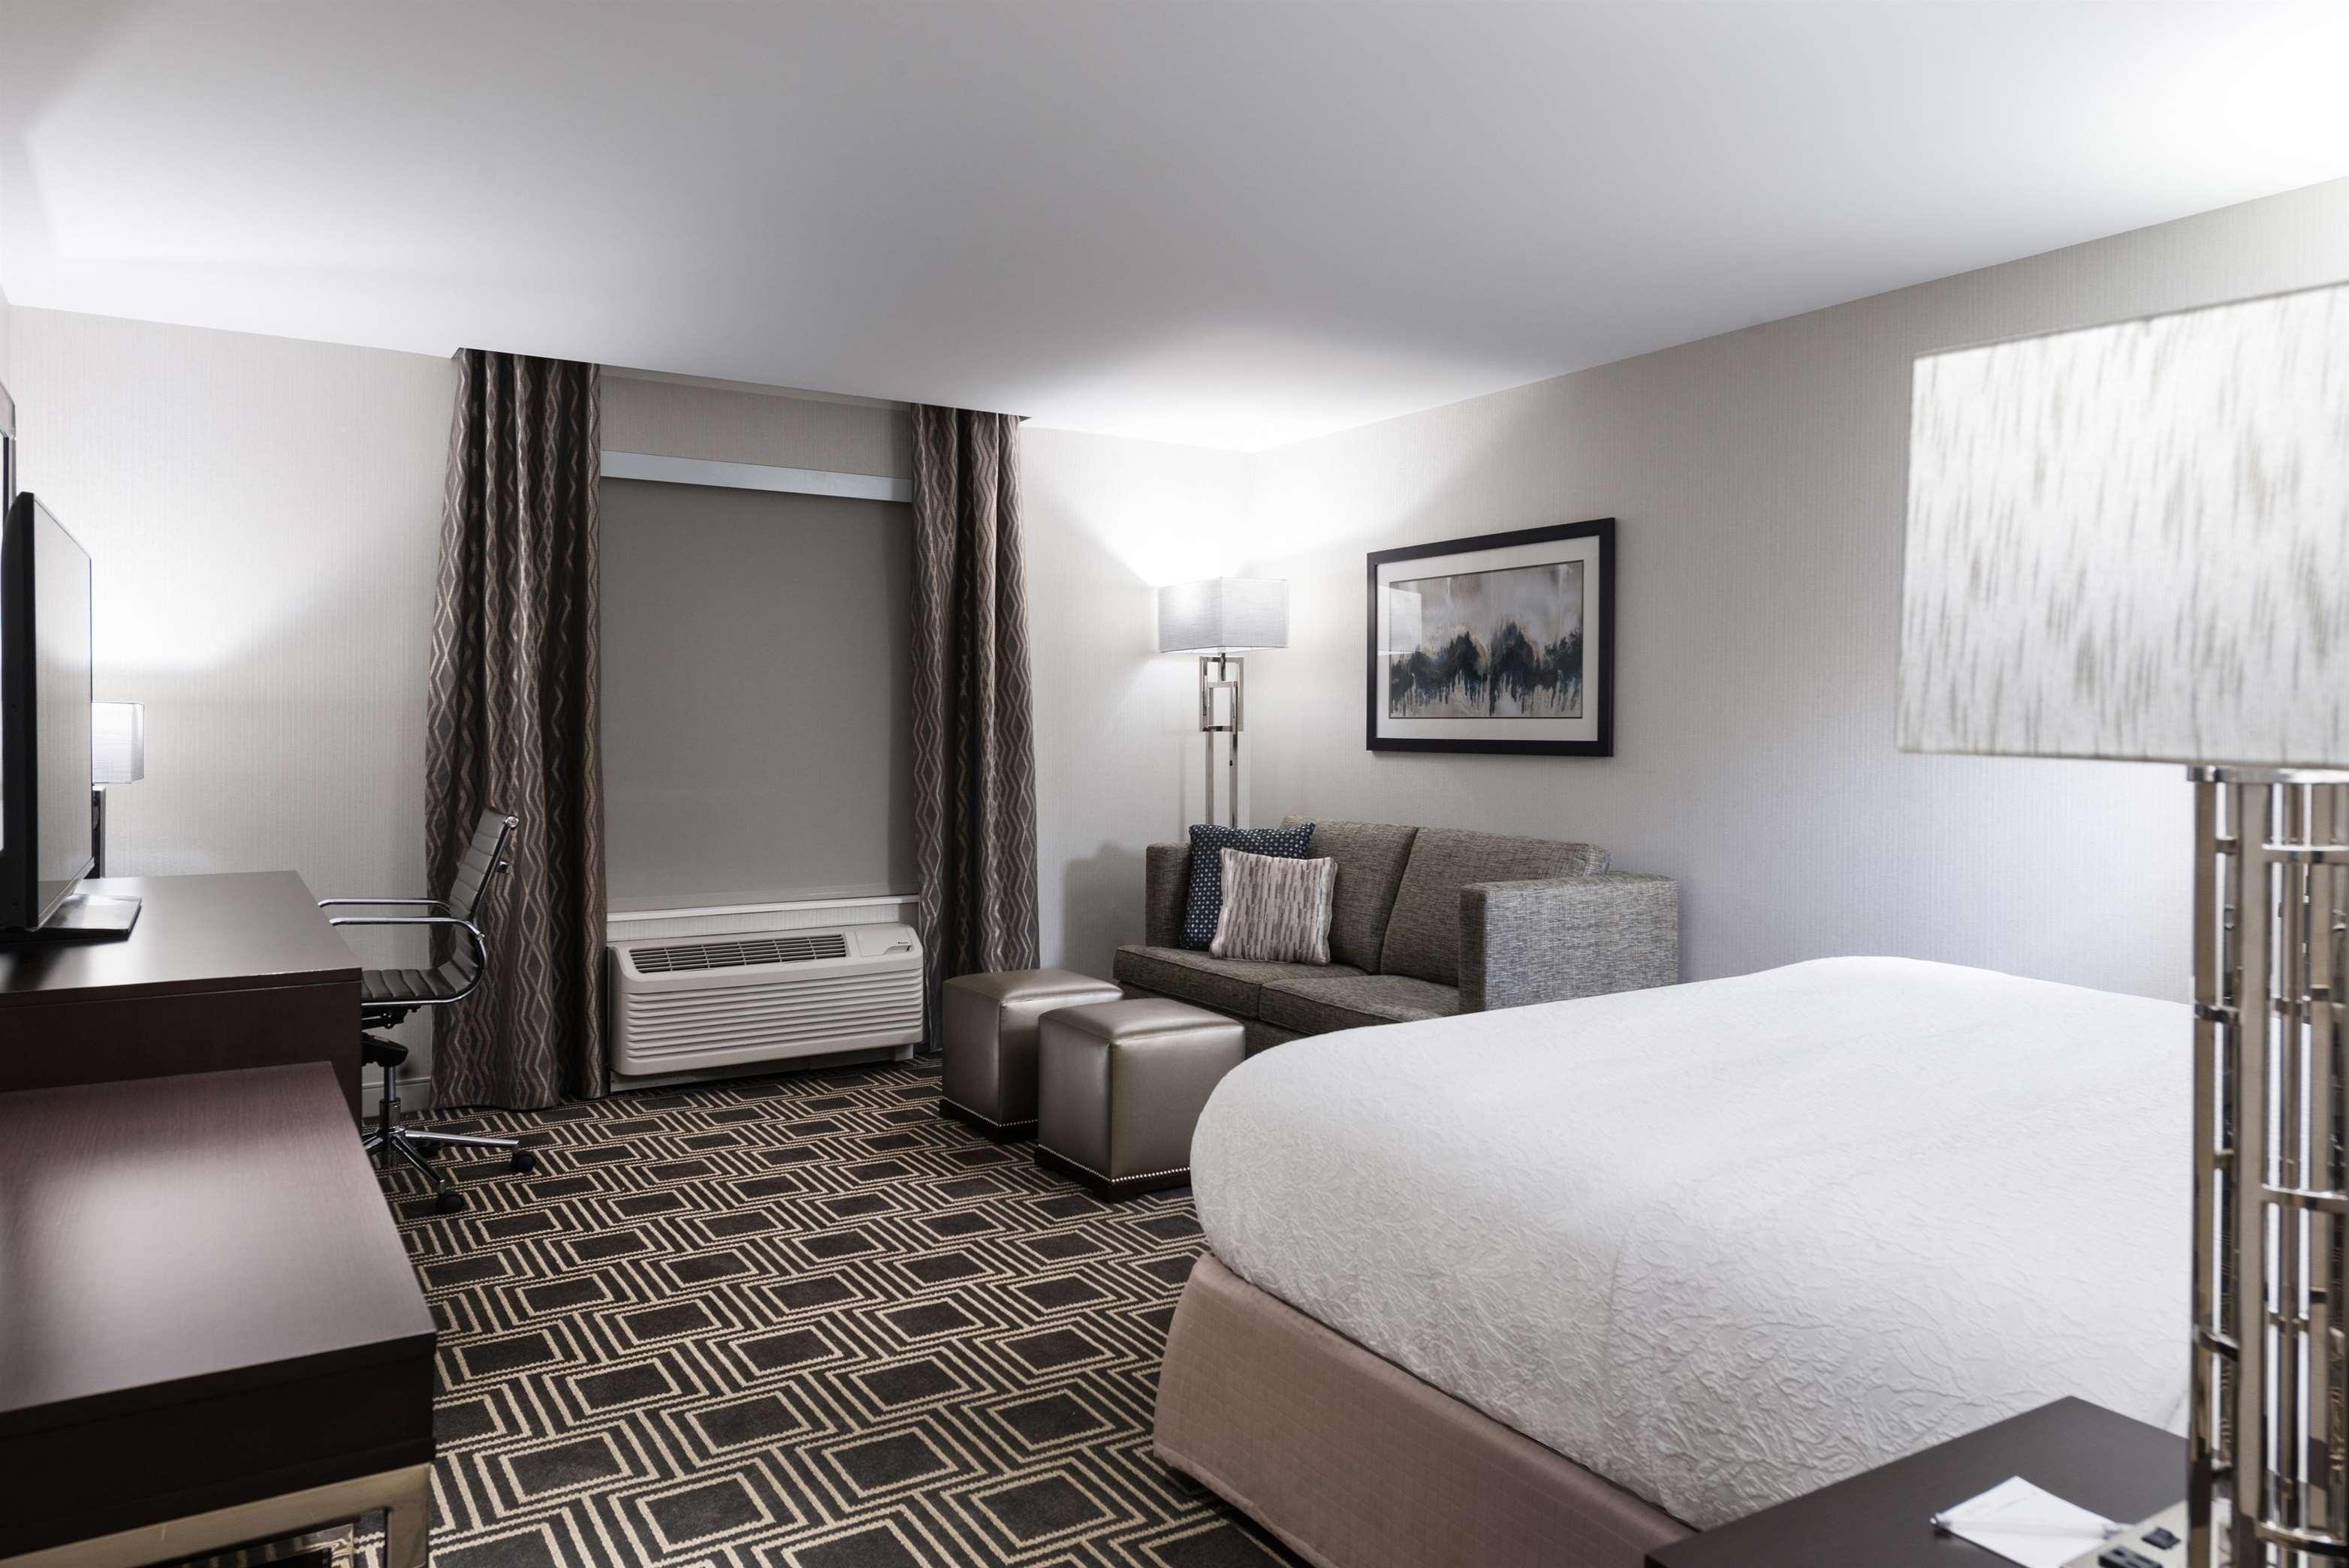 Hampton Inn & Suites Worcester image 1